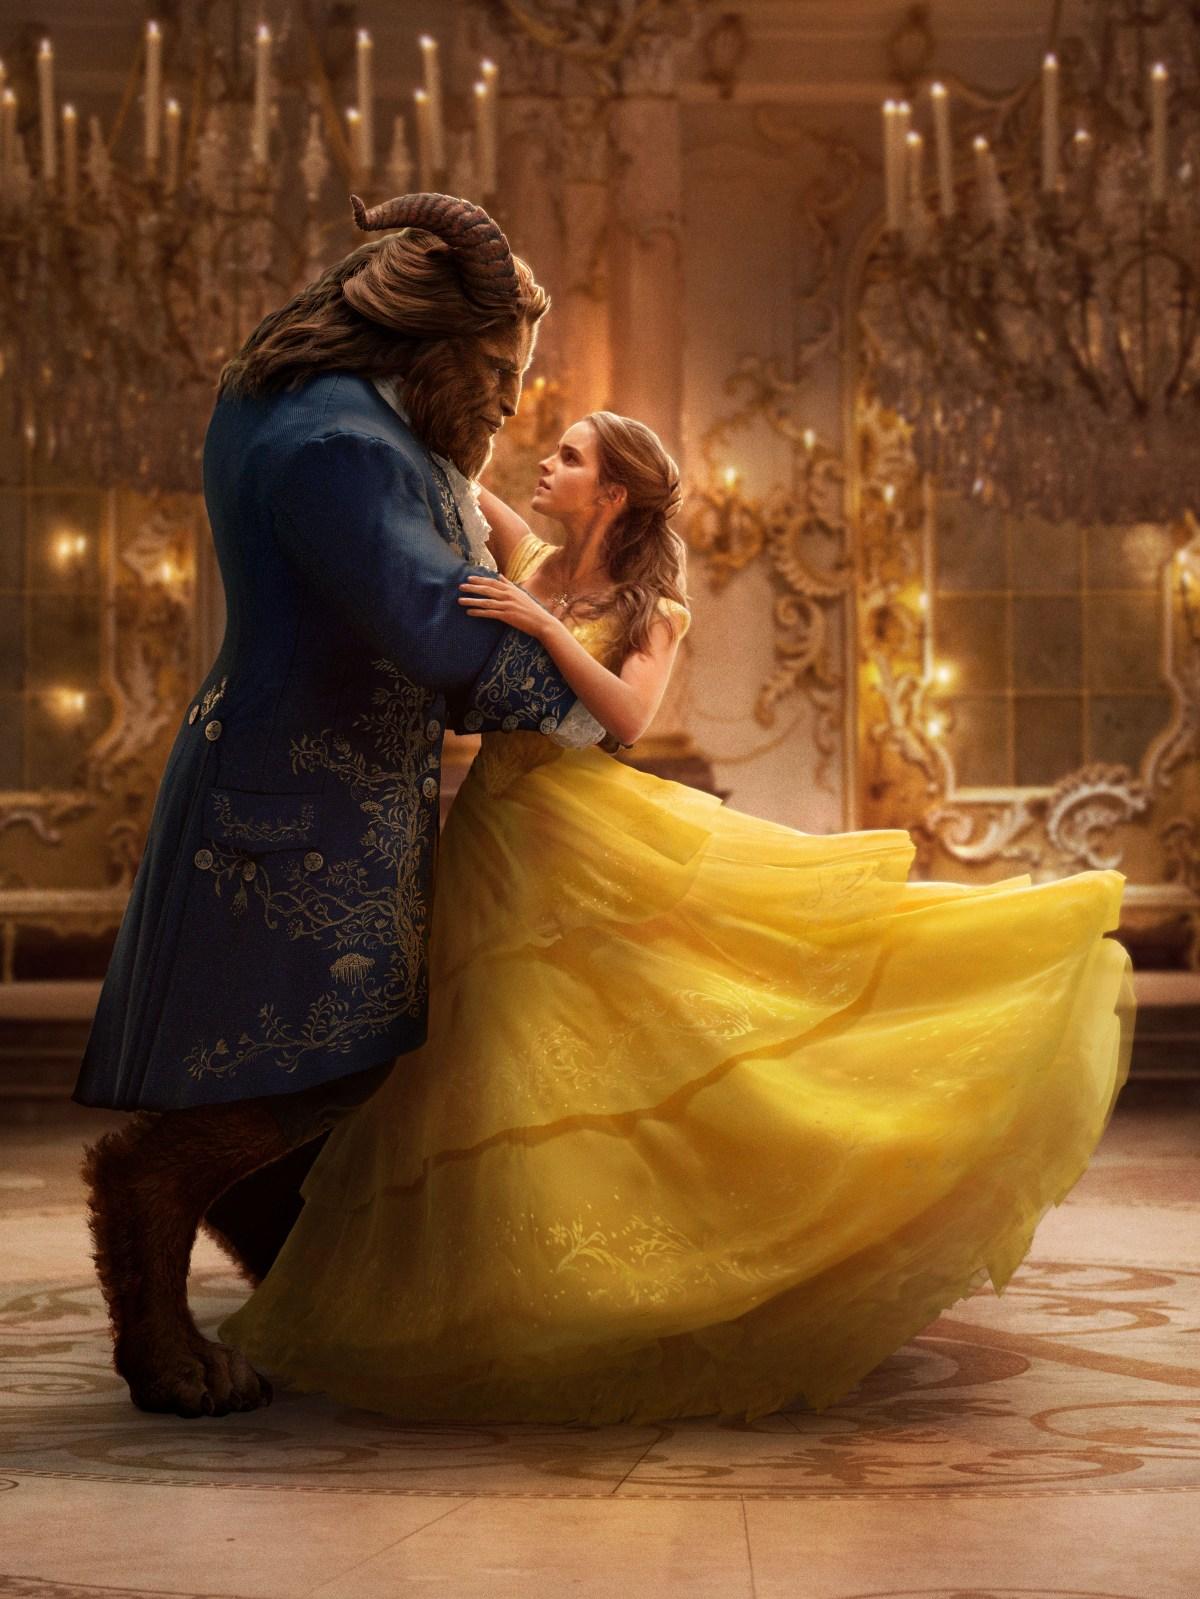 beautyandthebeast-belle-and-the-beast